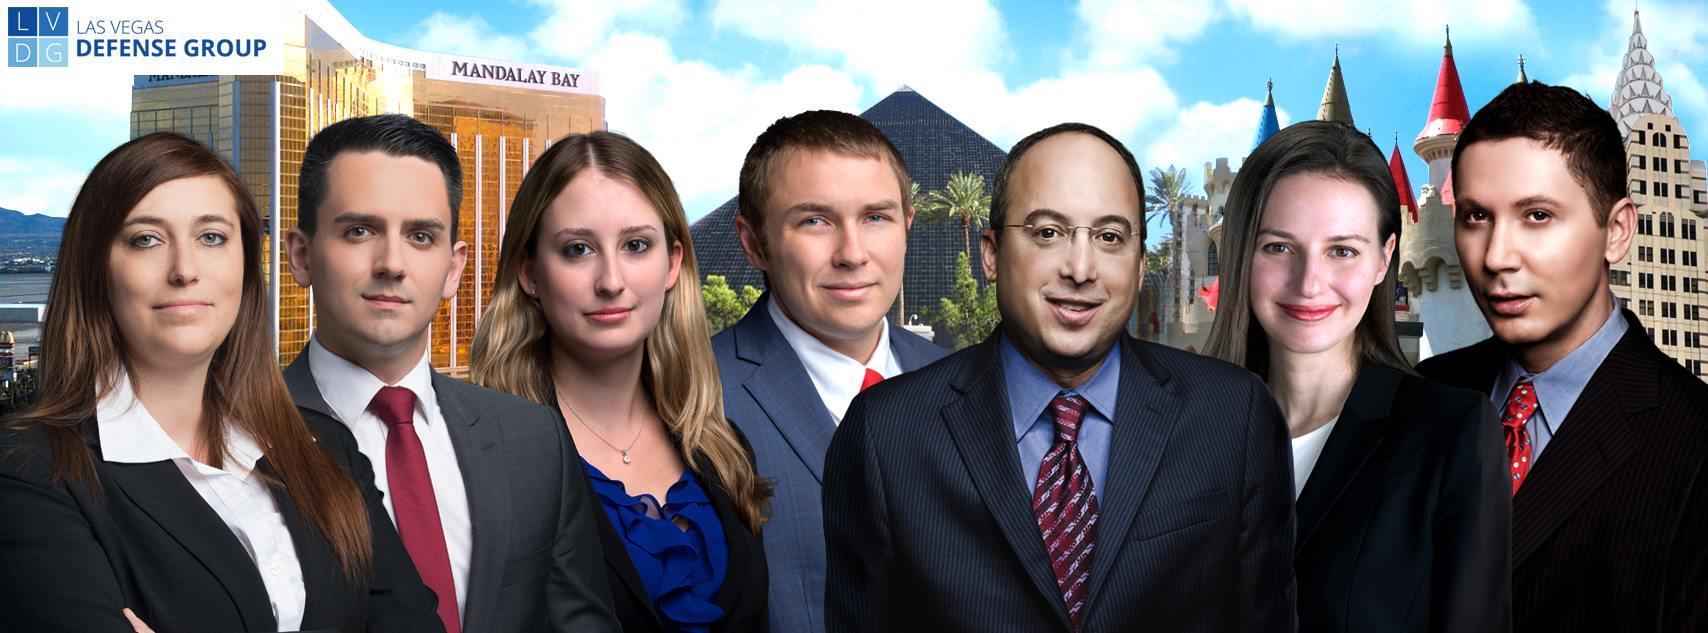 Las Vegas Defense Group, LLC   Lawyers in 2300 W. Sahara Avenue - Las Vegas NV - Reviews - Photos - Phone Number